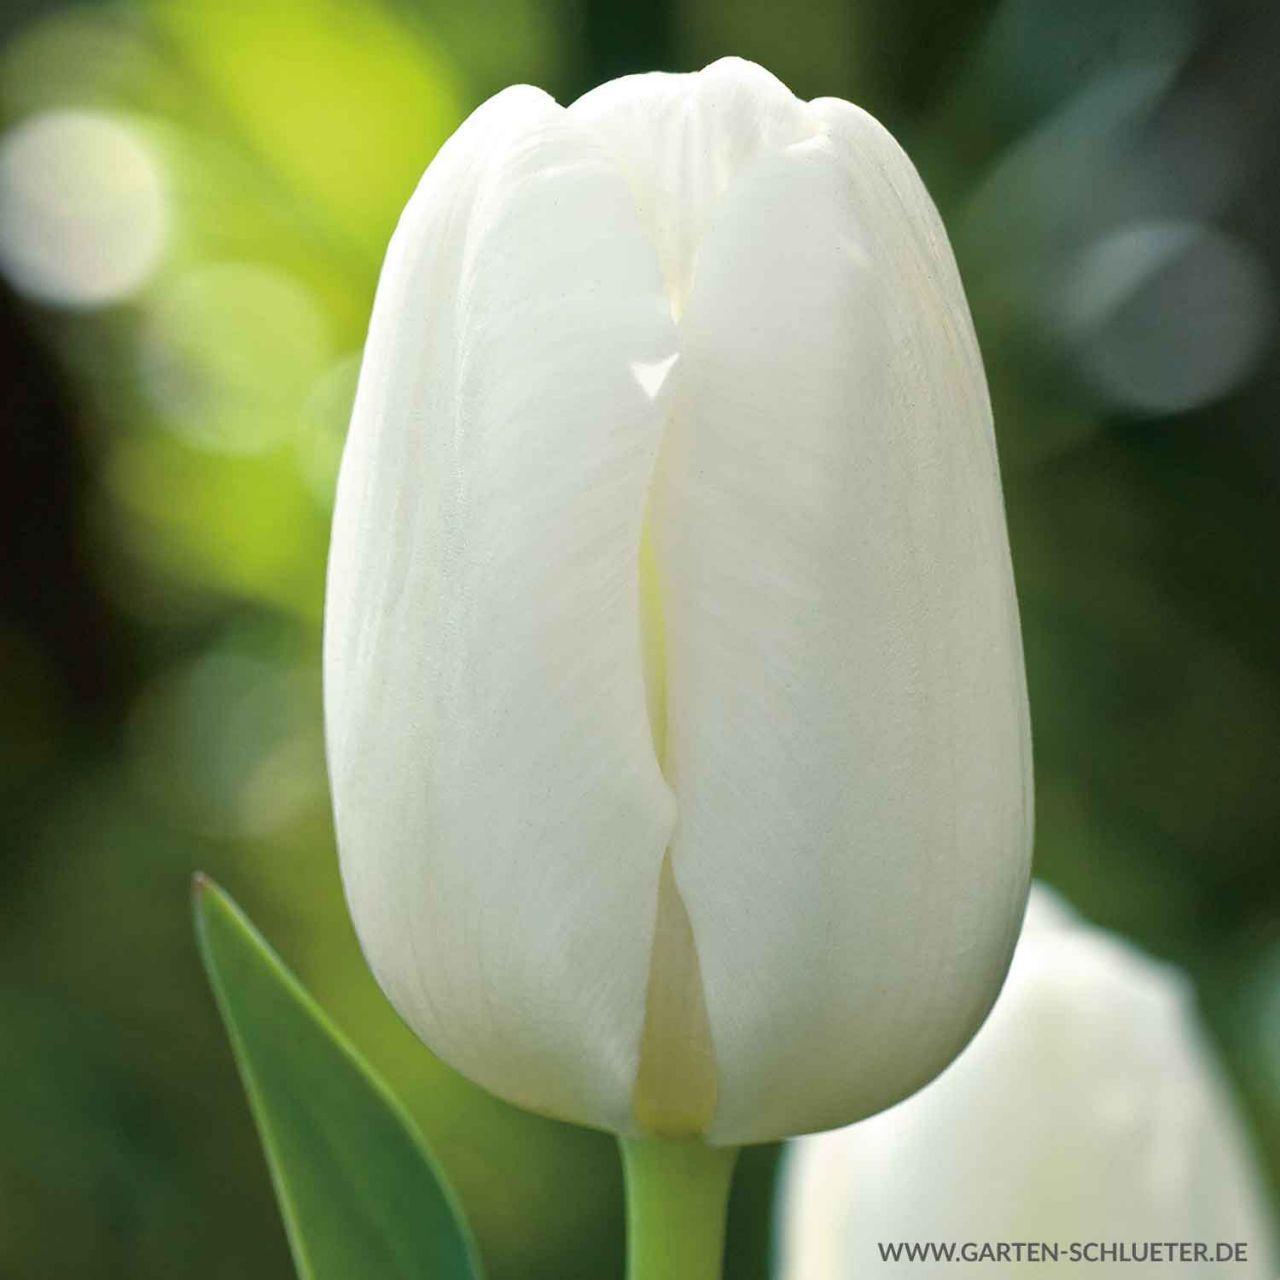 Garten-Schlueter.de: Einfache frühe Tulpe Pim Fortuyn - 10 Stück